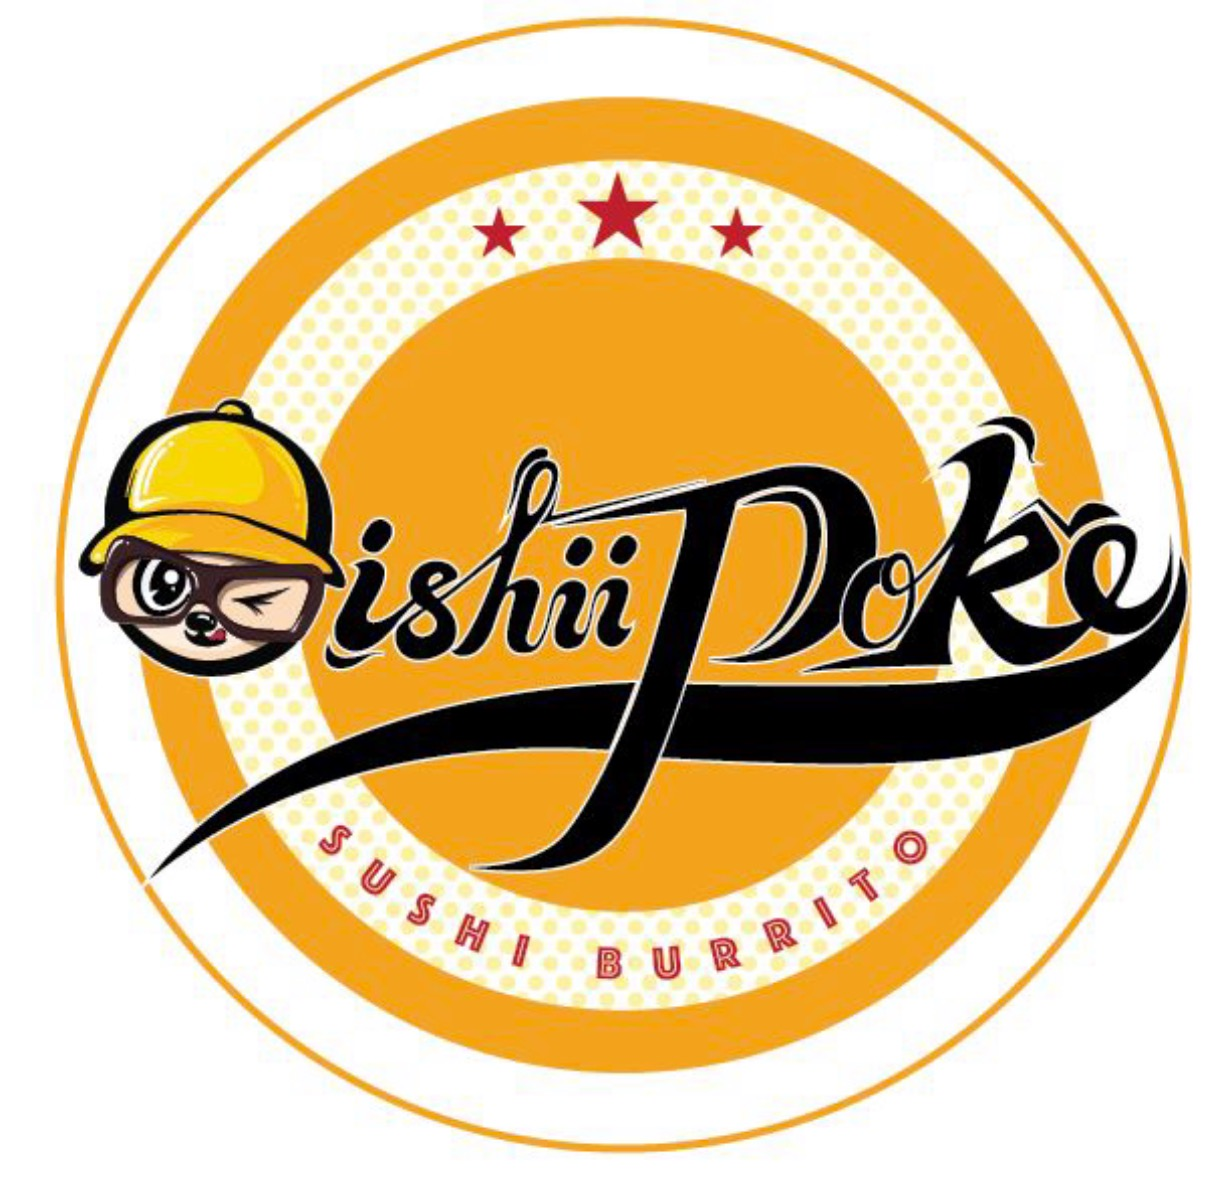 Oishii.jpg